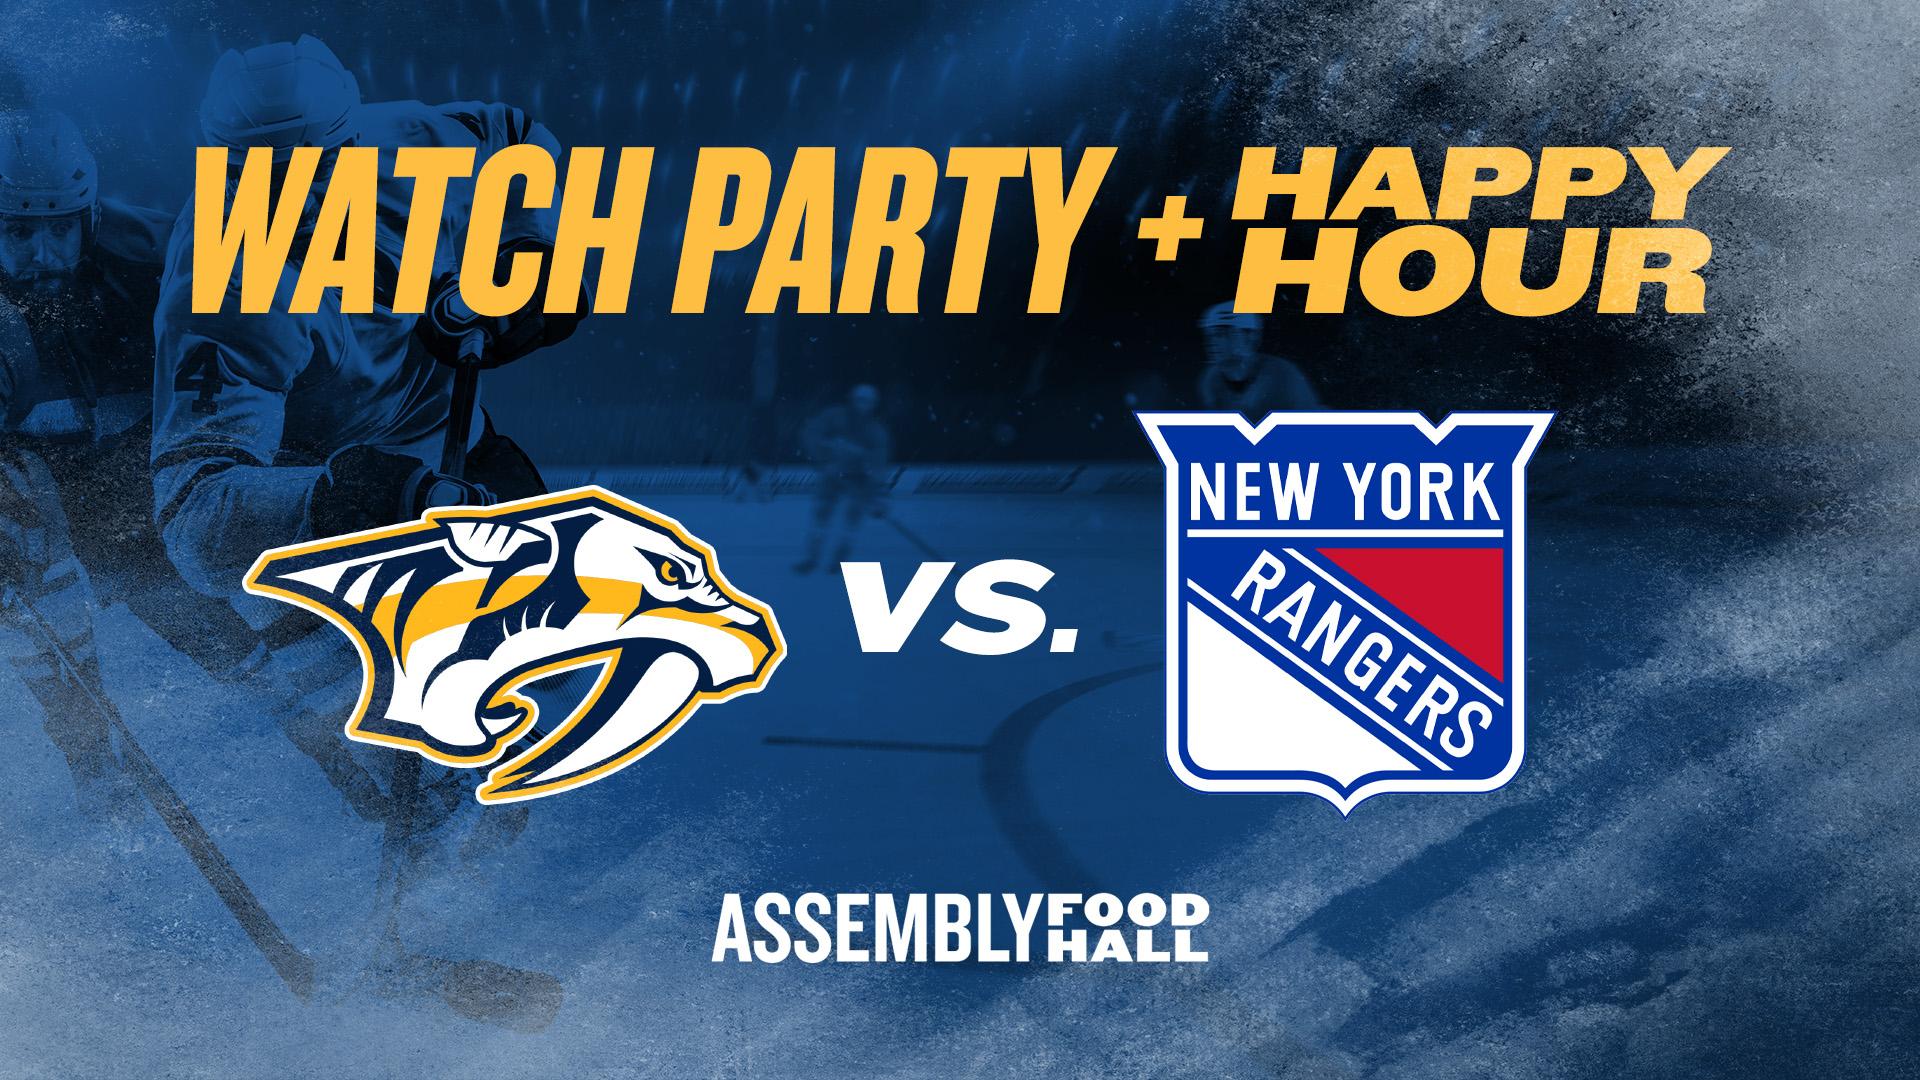 Predators vs. New York Rangers I Watch Party & Happy Hour - hero